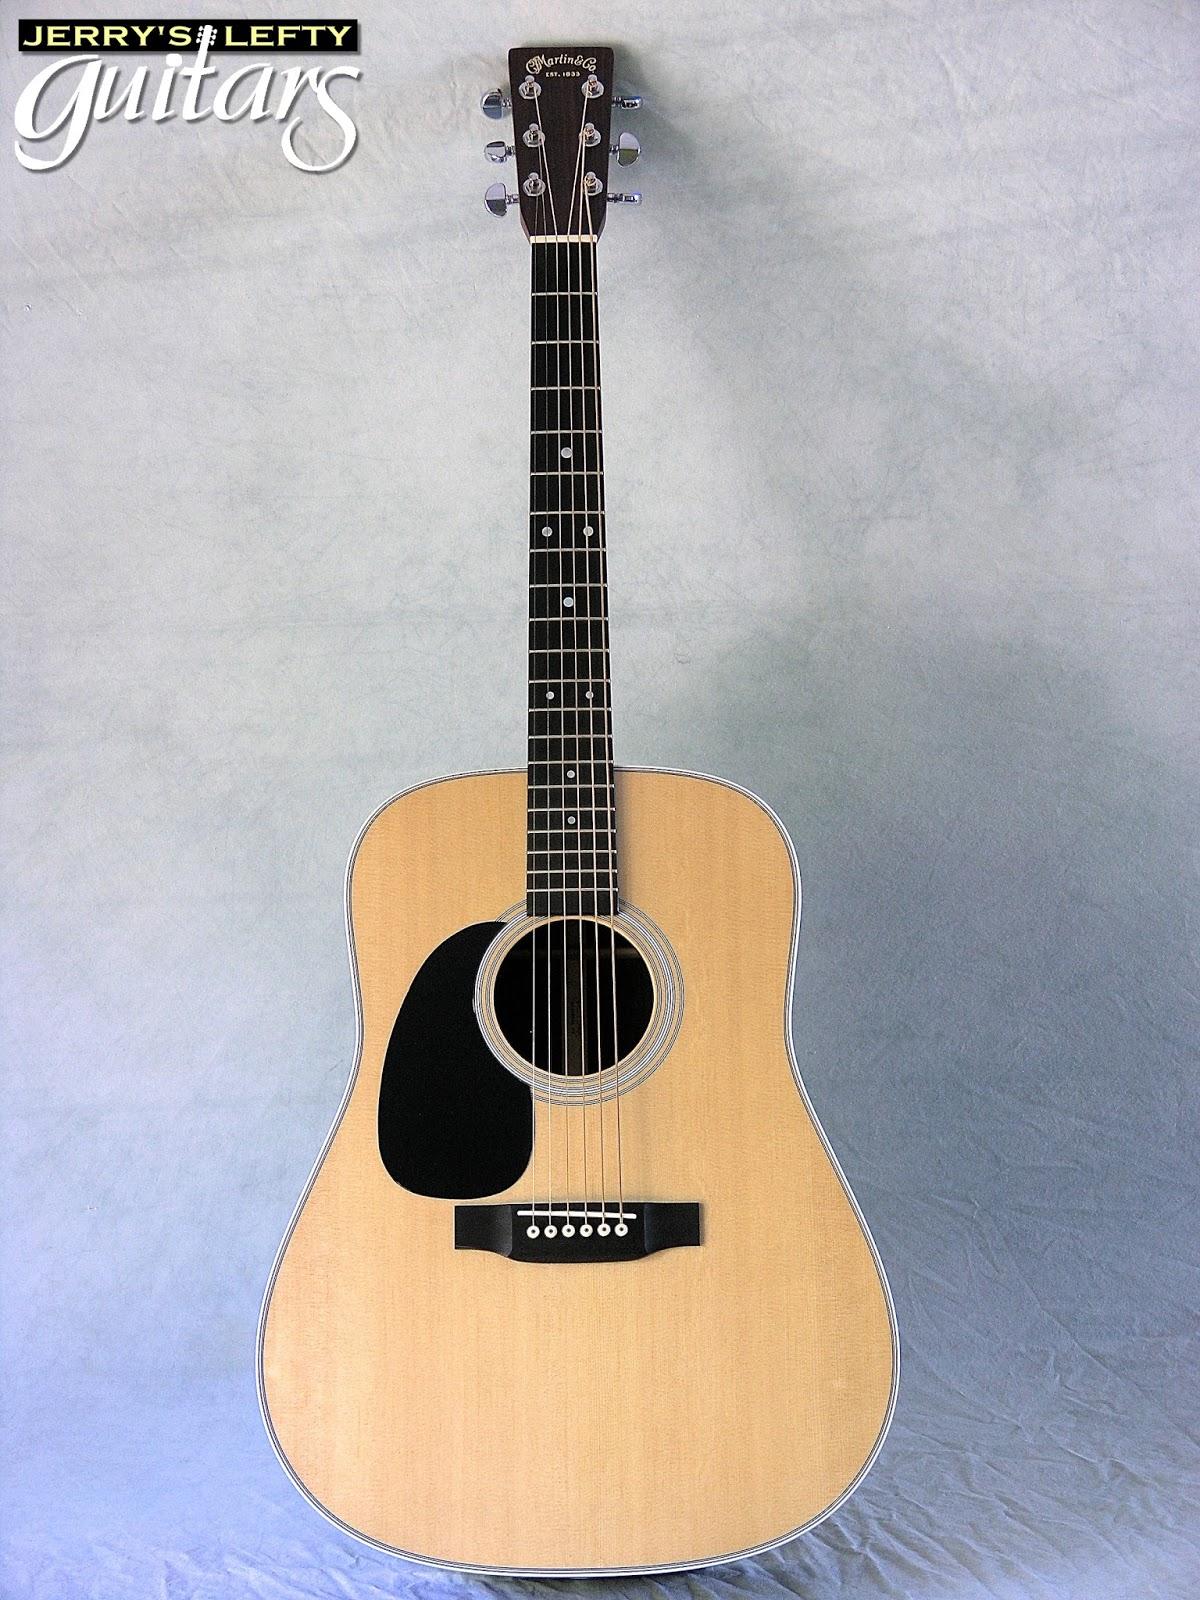 jerry 39 s lefty guitars newest guitar arrivals updated weekly martin d28 used left handed. Black Bedroom Furniture Sets. Home Design Ideas